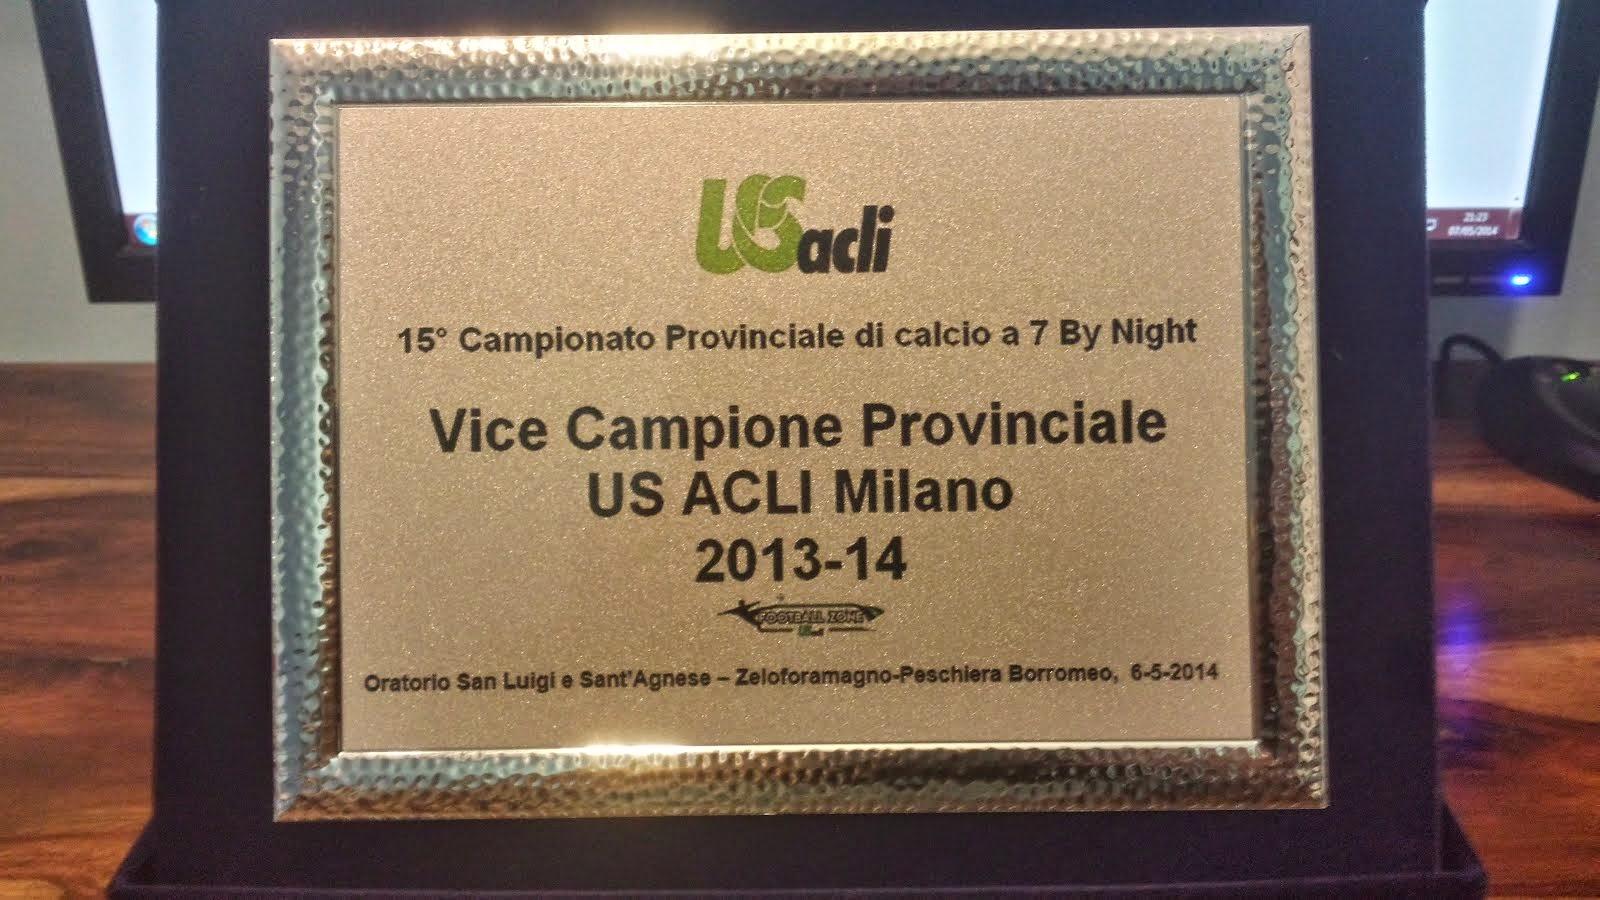 Vice Campione Provinciale 2013-2014